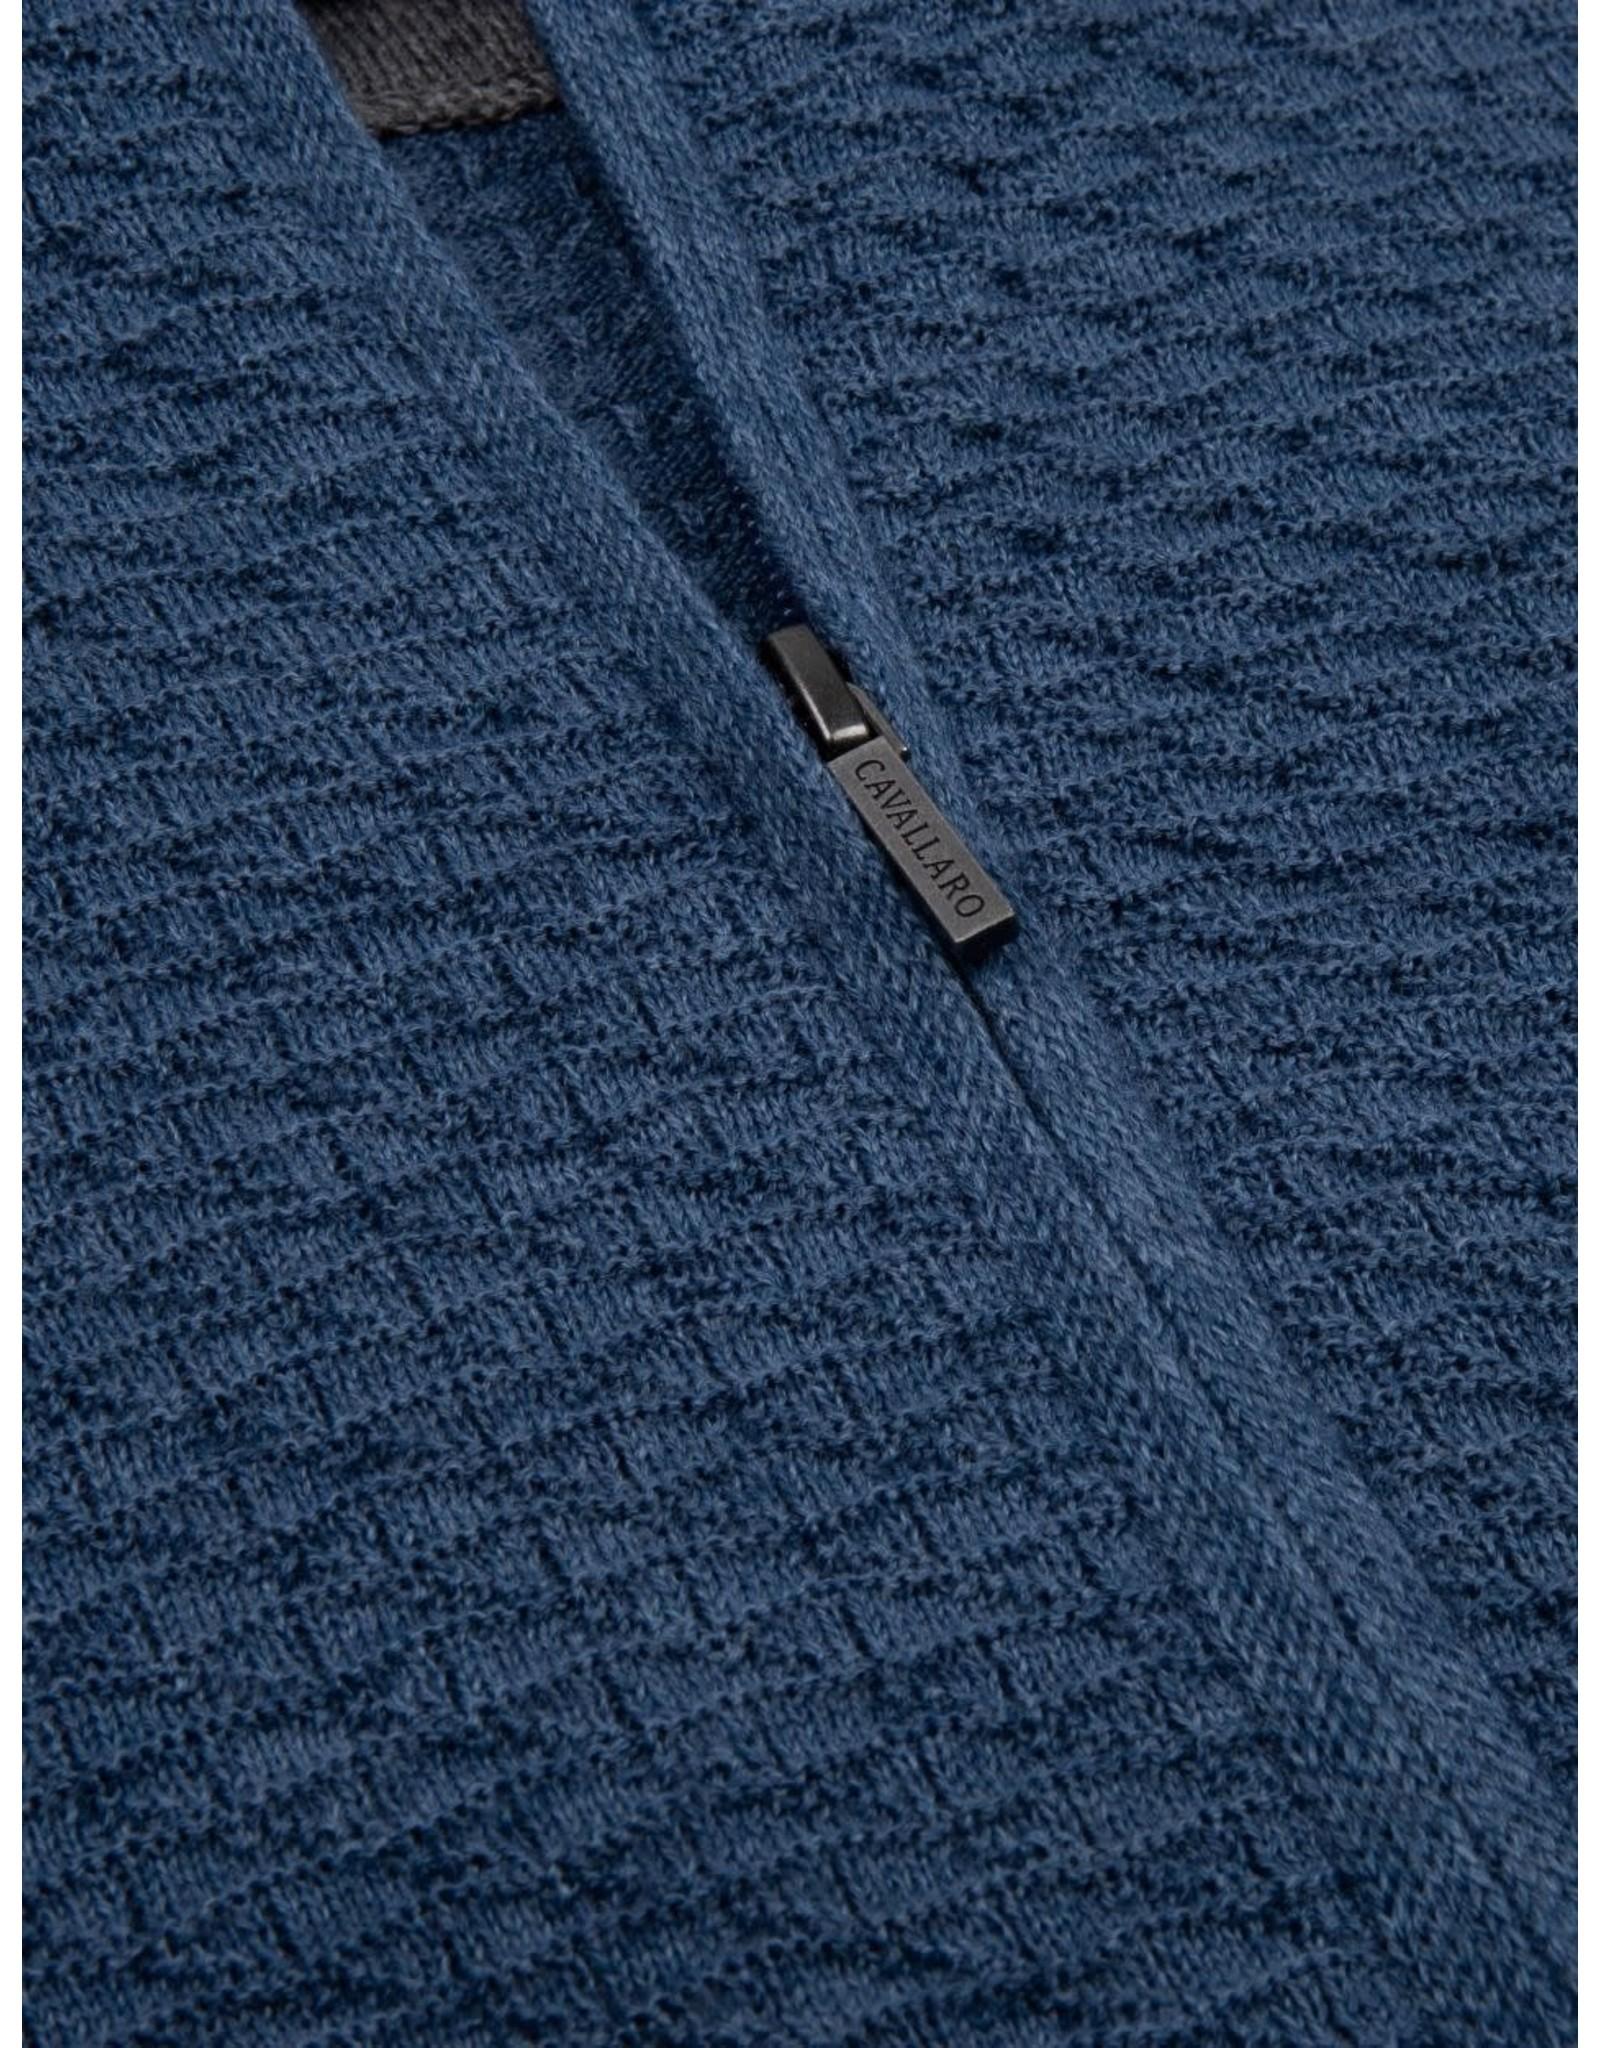 Cavallaro Cavallaro Dalmine Cardigan Light Blue